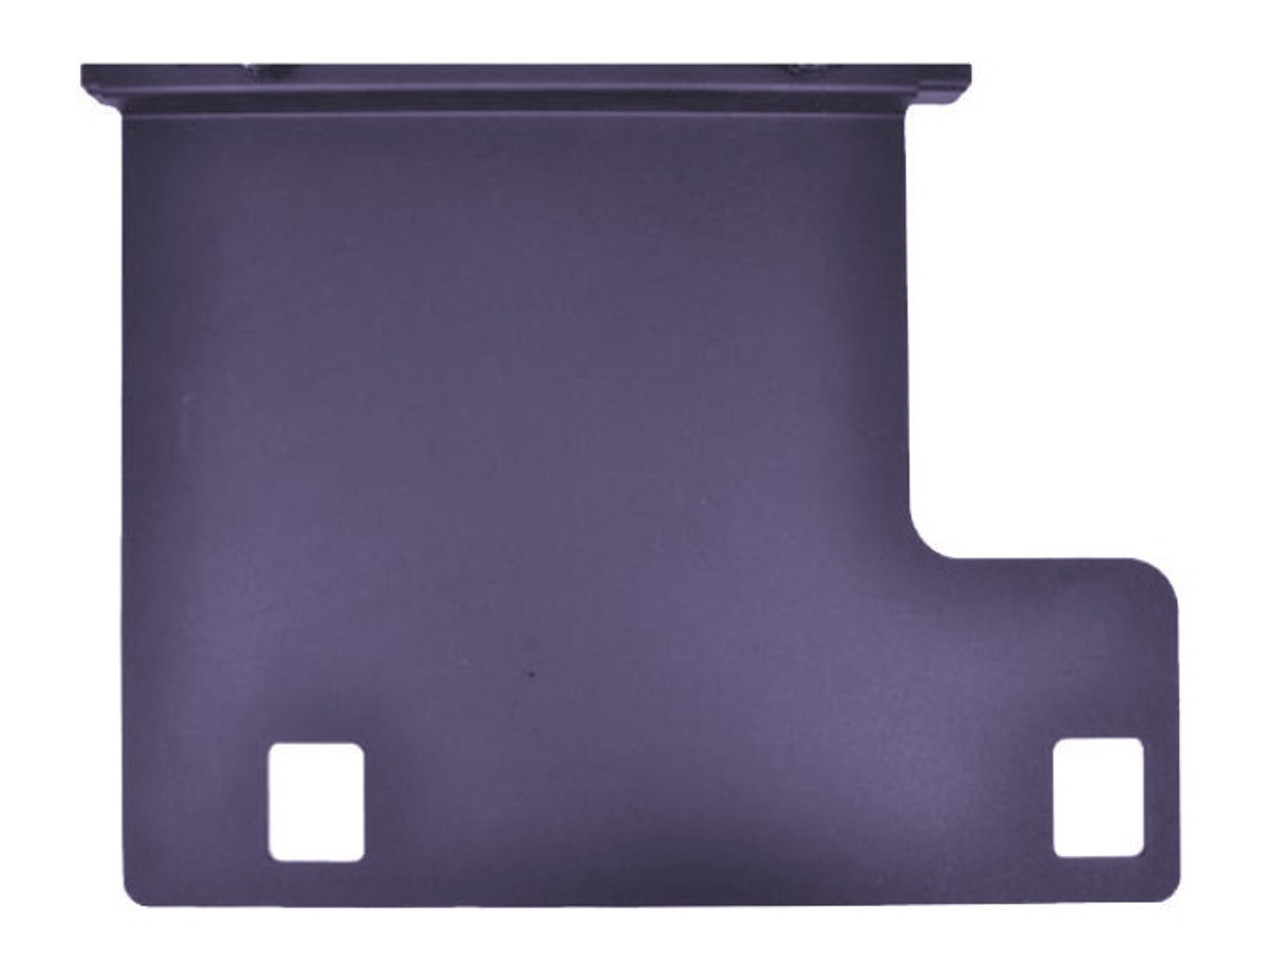 Junction Plate TM-C7500 Unwinder